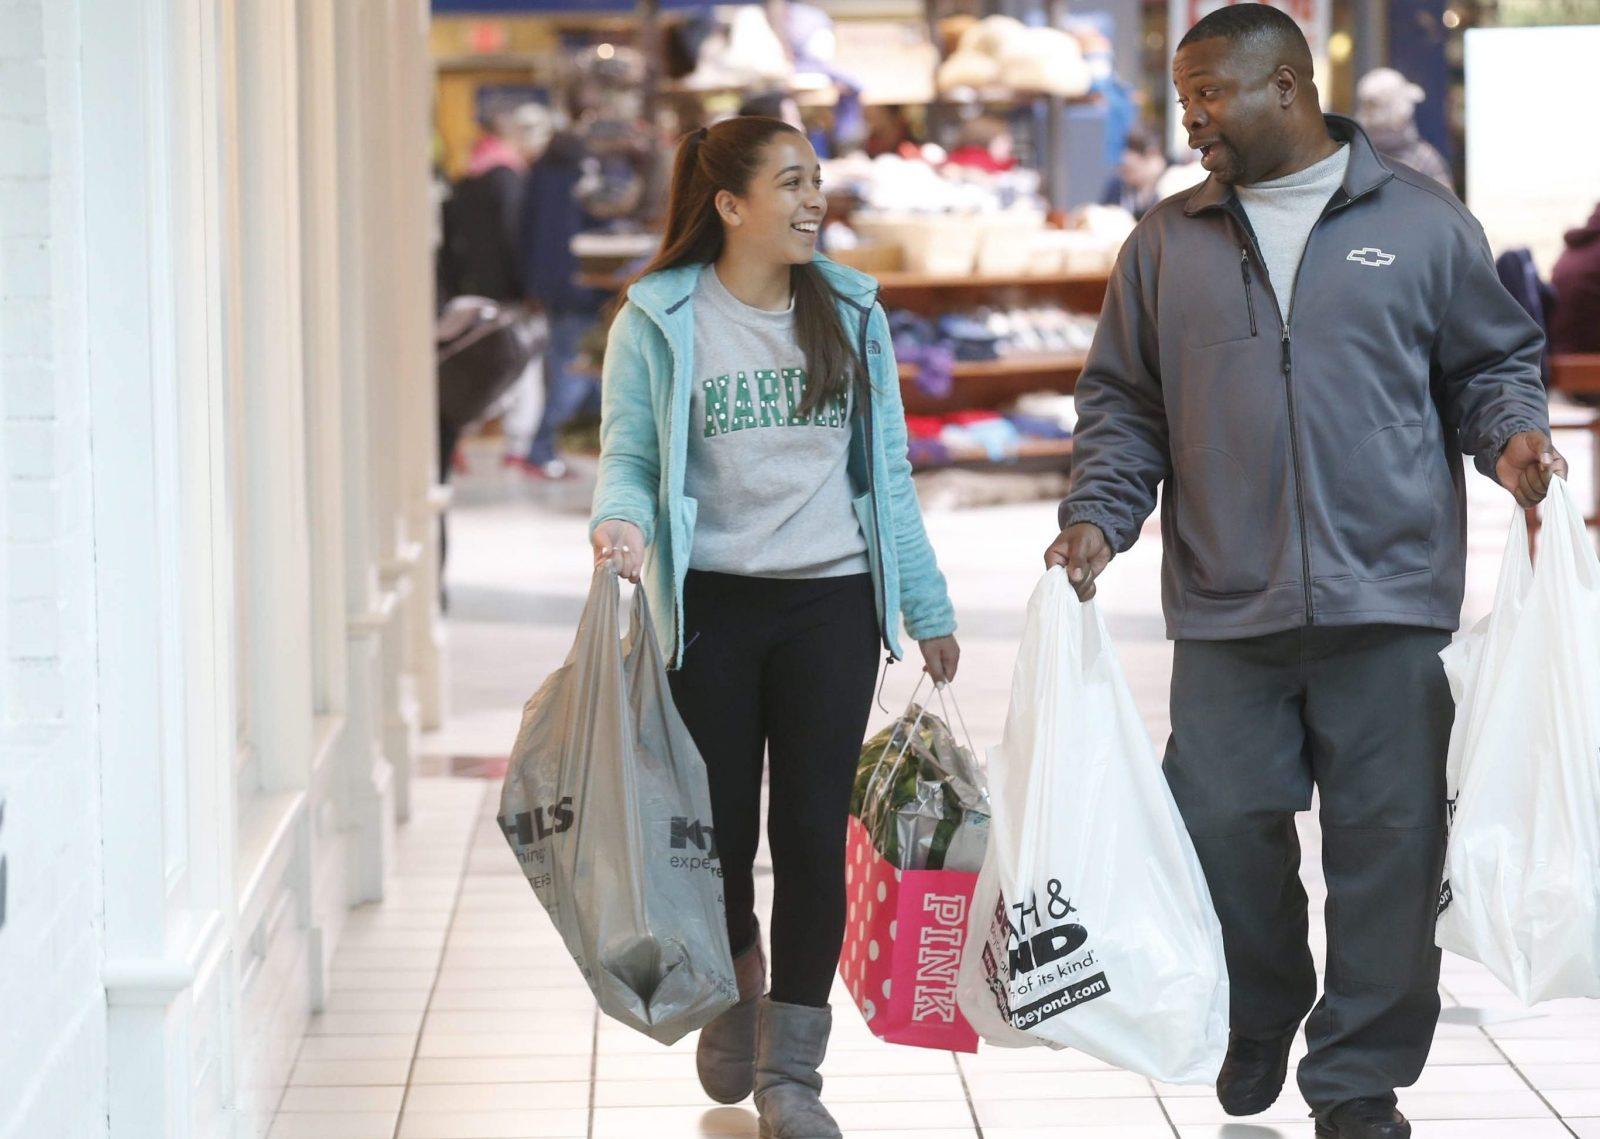 David Hartley and his daughter Alyssa, 13, of Amherst, shop at Boulevard Mall on Niagara Falls Boulevard. (Robert Kirkham/Buffalo News)